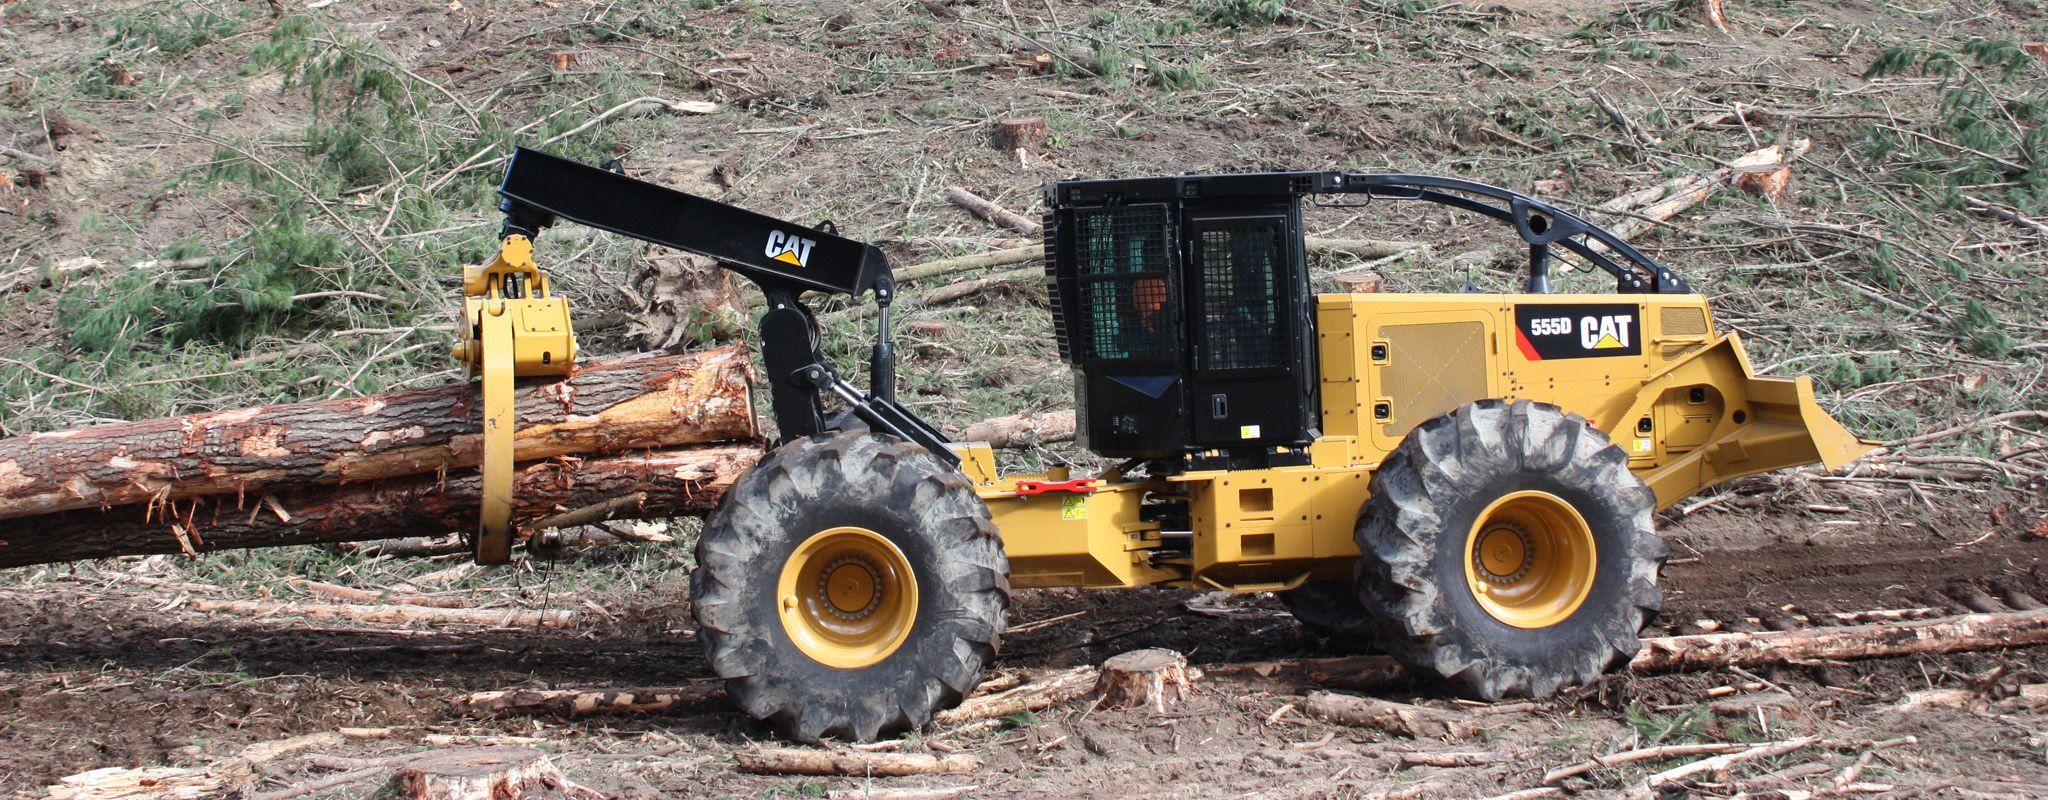 100+ Machines Used For Logging – yasminroohi